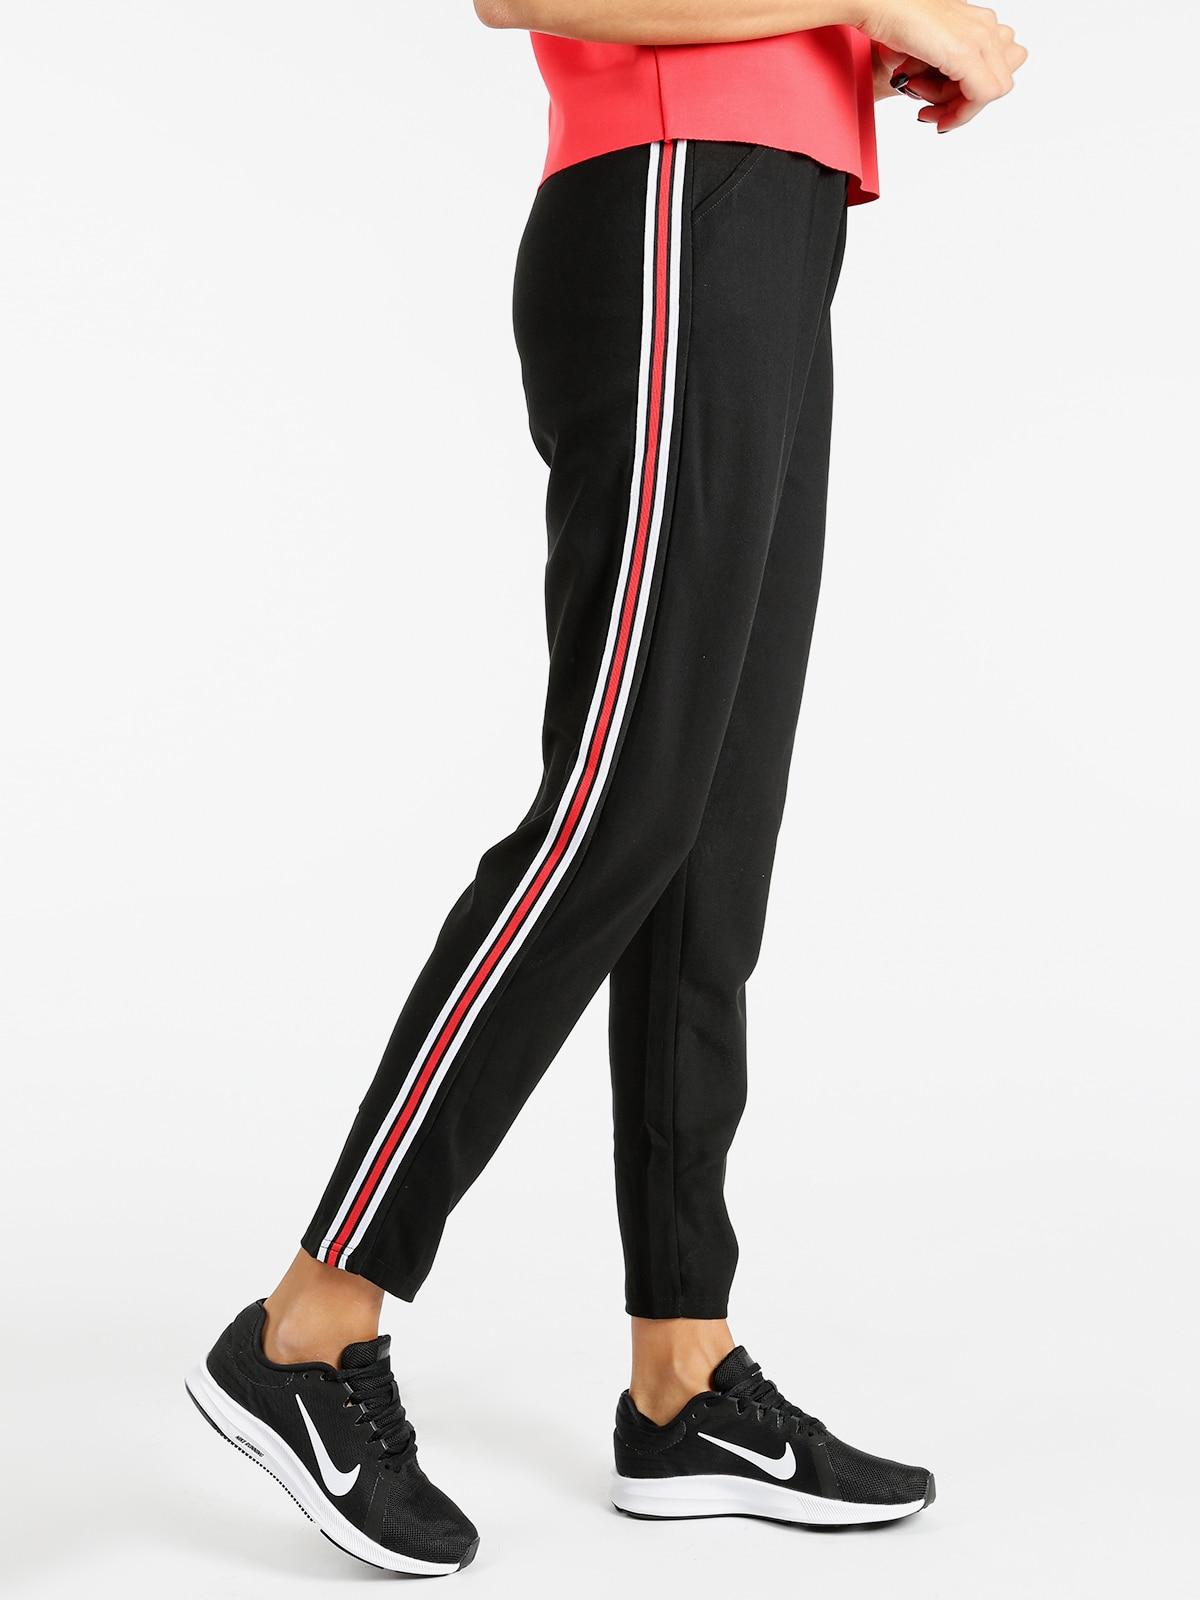 Black Pants With Stripe